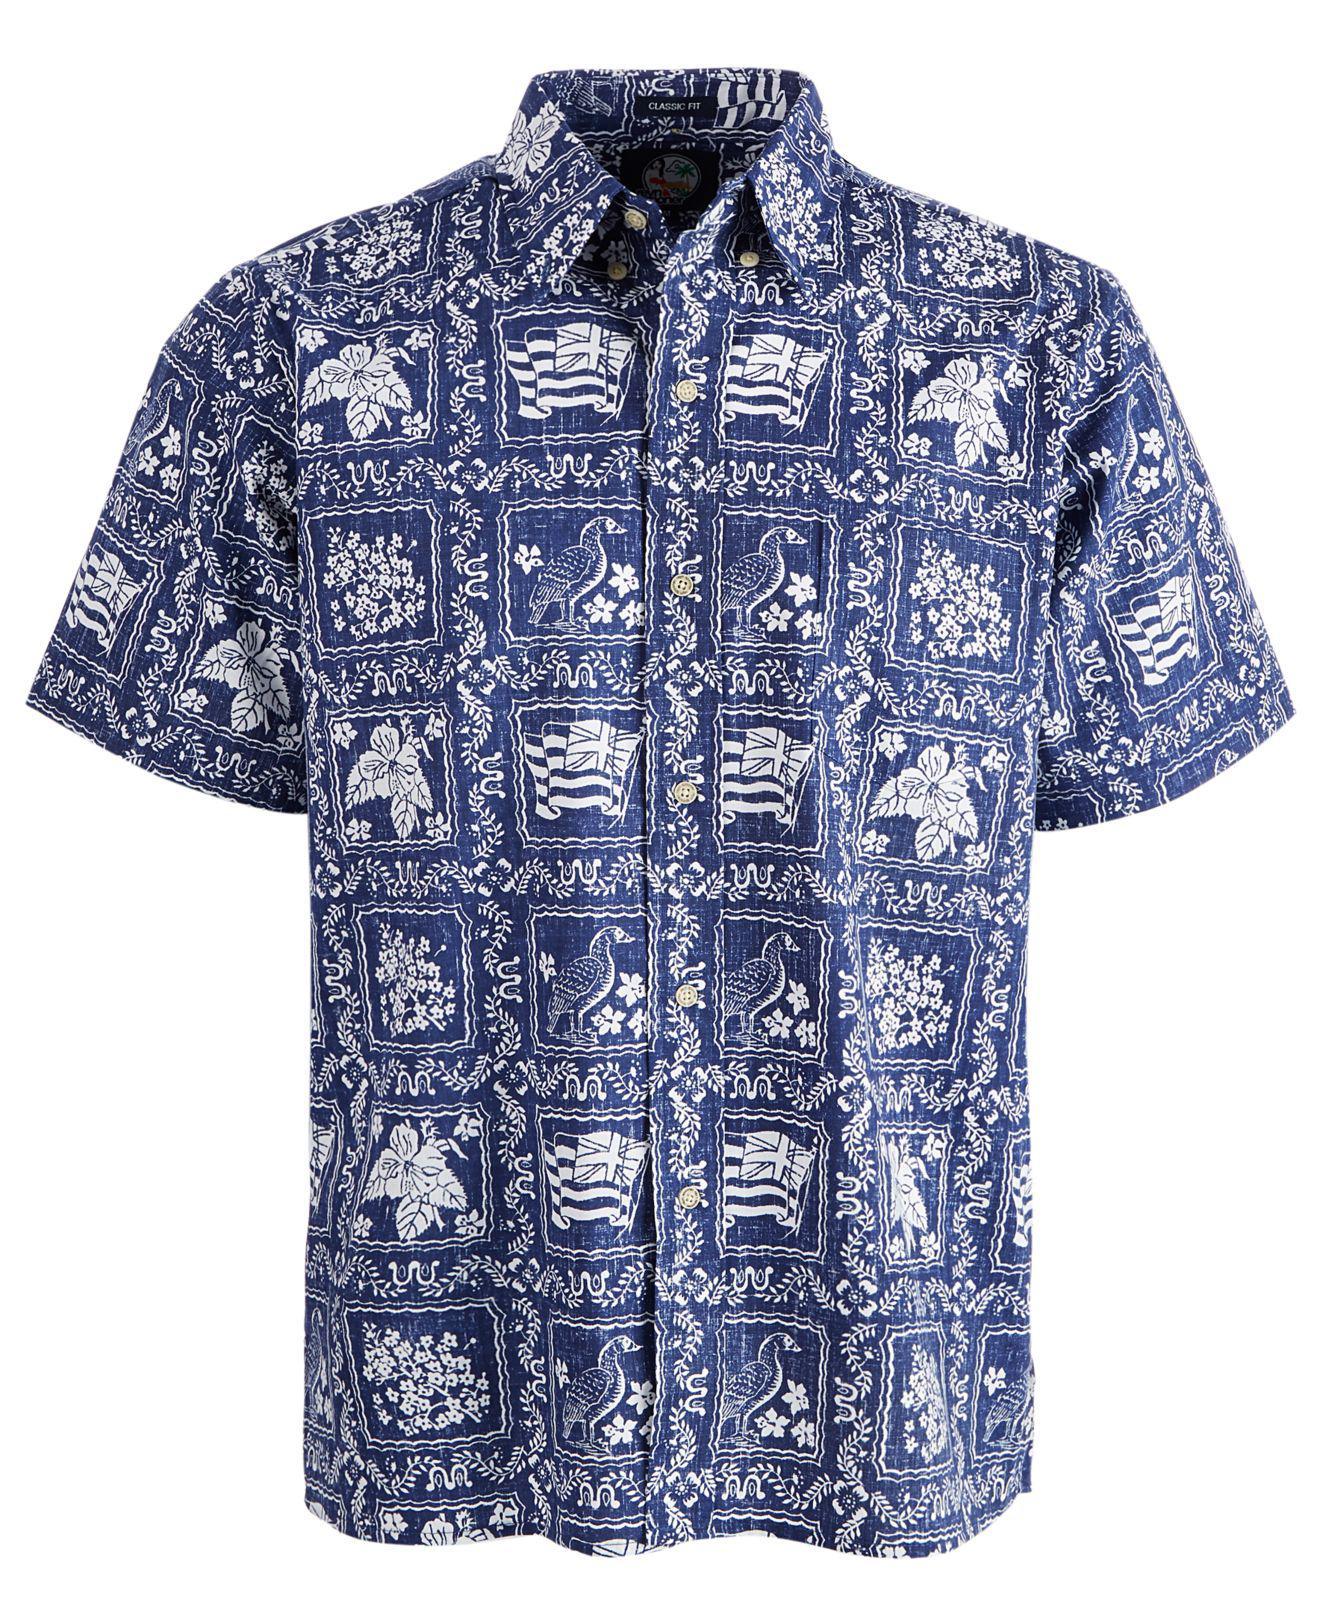 27916b5ab90 Lyst - Reyn Spooner Printed Shirt in Blue for Men